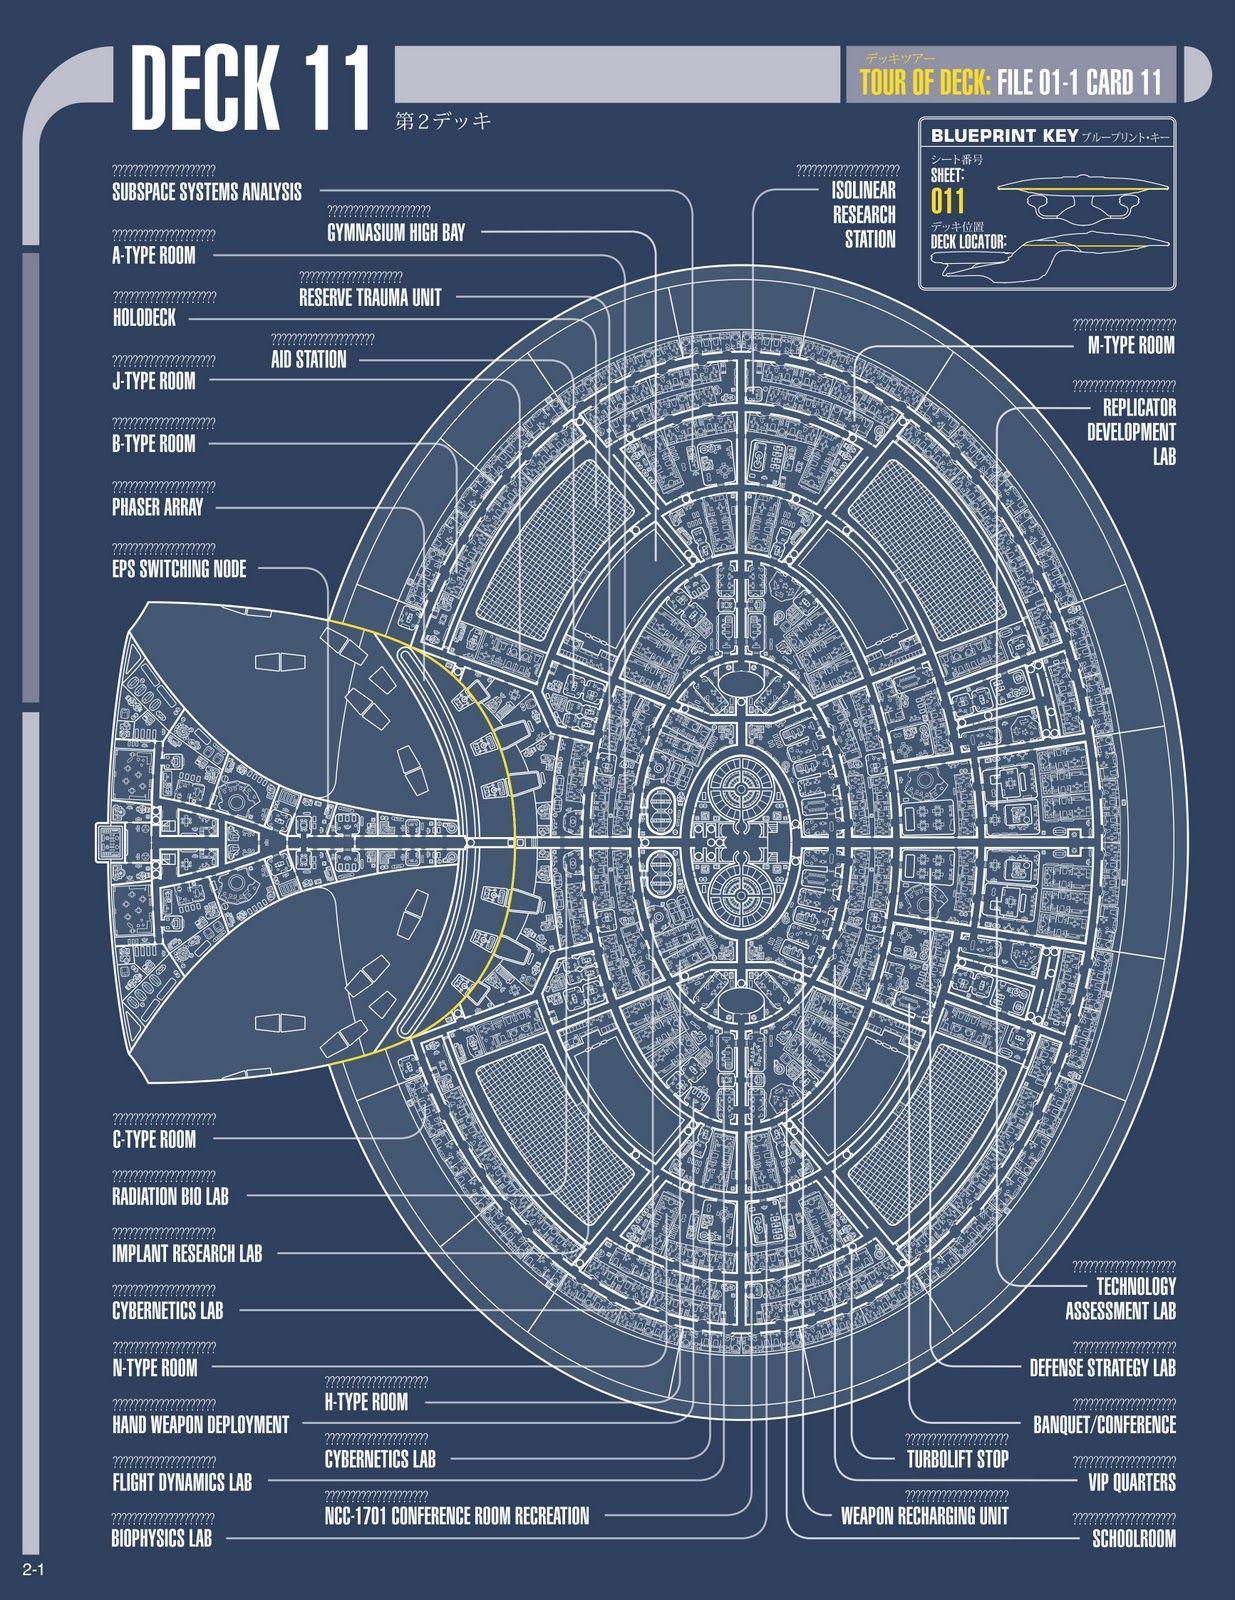 Uss enterprise ncc 1701 d galaxy class saucer separation r flickr - Blueprint Schematic Of Deck Eleven Of Saucer Section From U Enterprise D